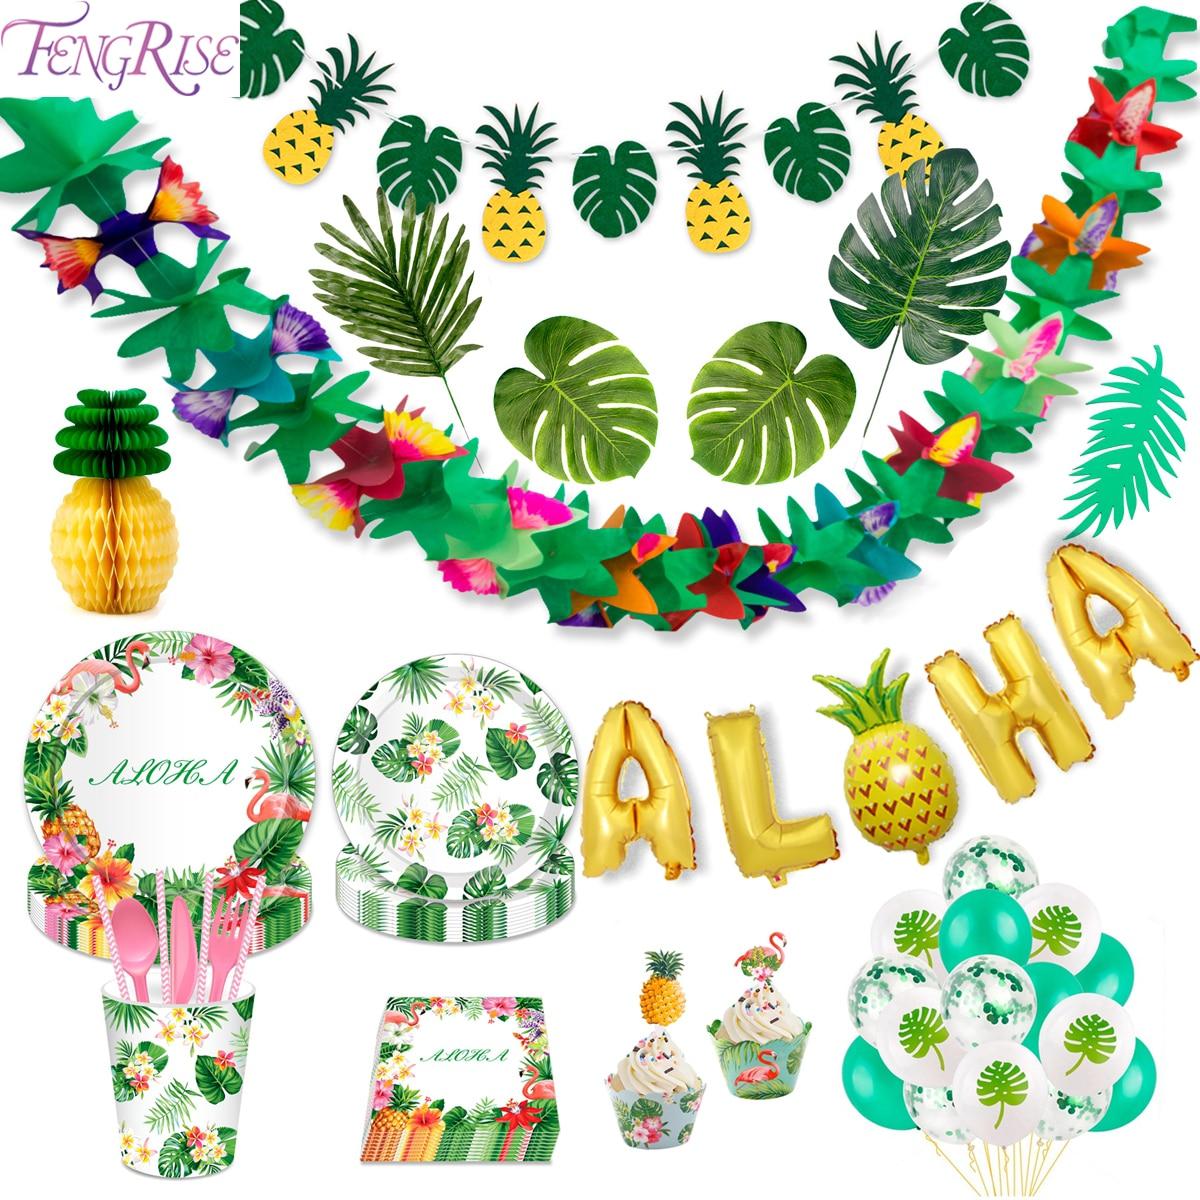 FENGRISE Palm Leaf Hawaiian Party Decorations Hawaii Tropical Party Summer Flamingo Party Luau Wedding Decor Aloha Pineapple